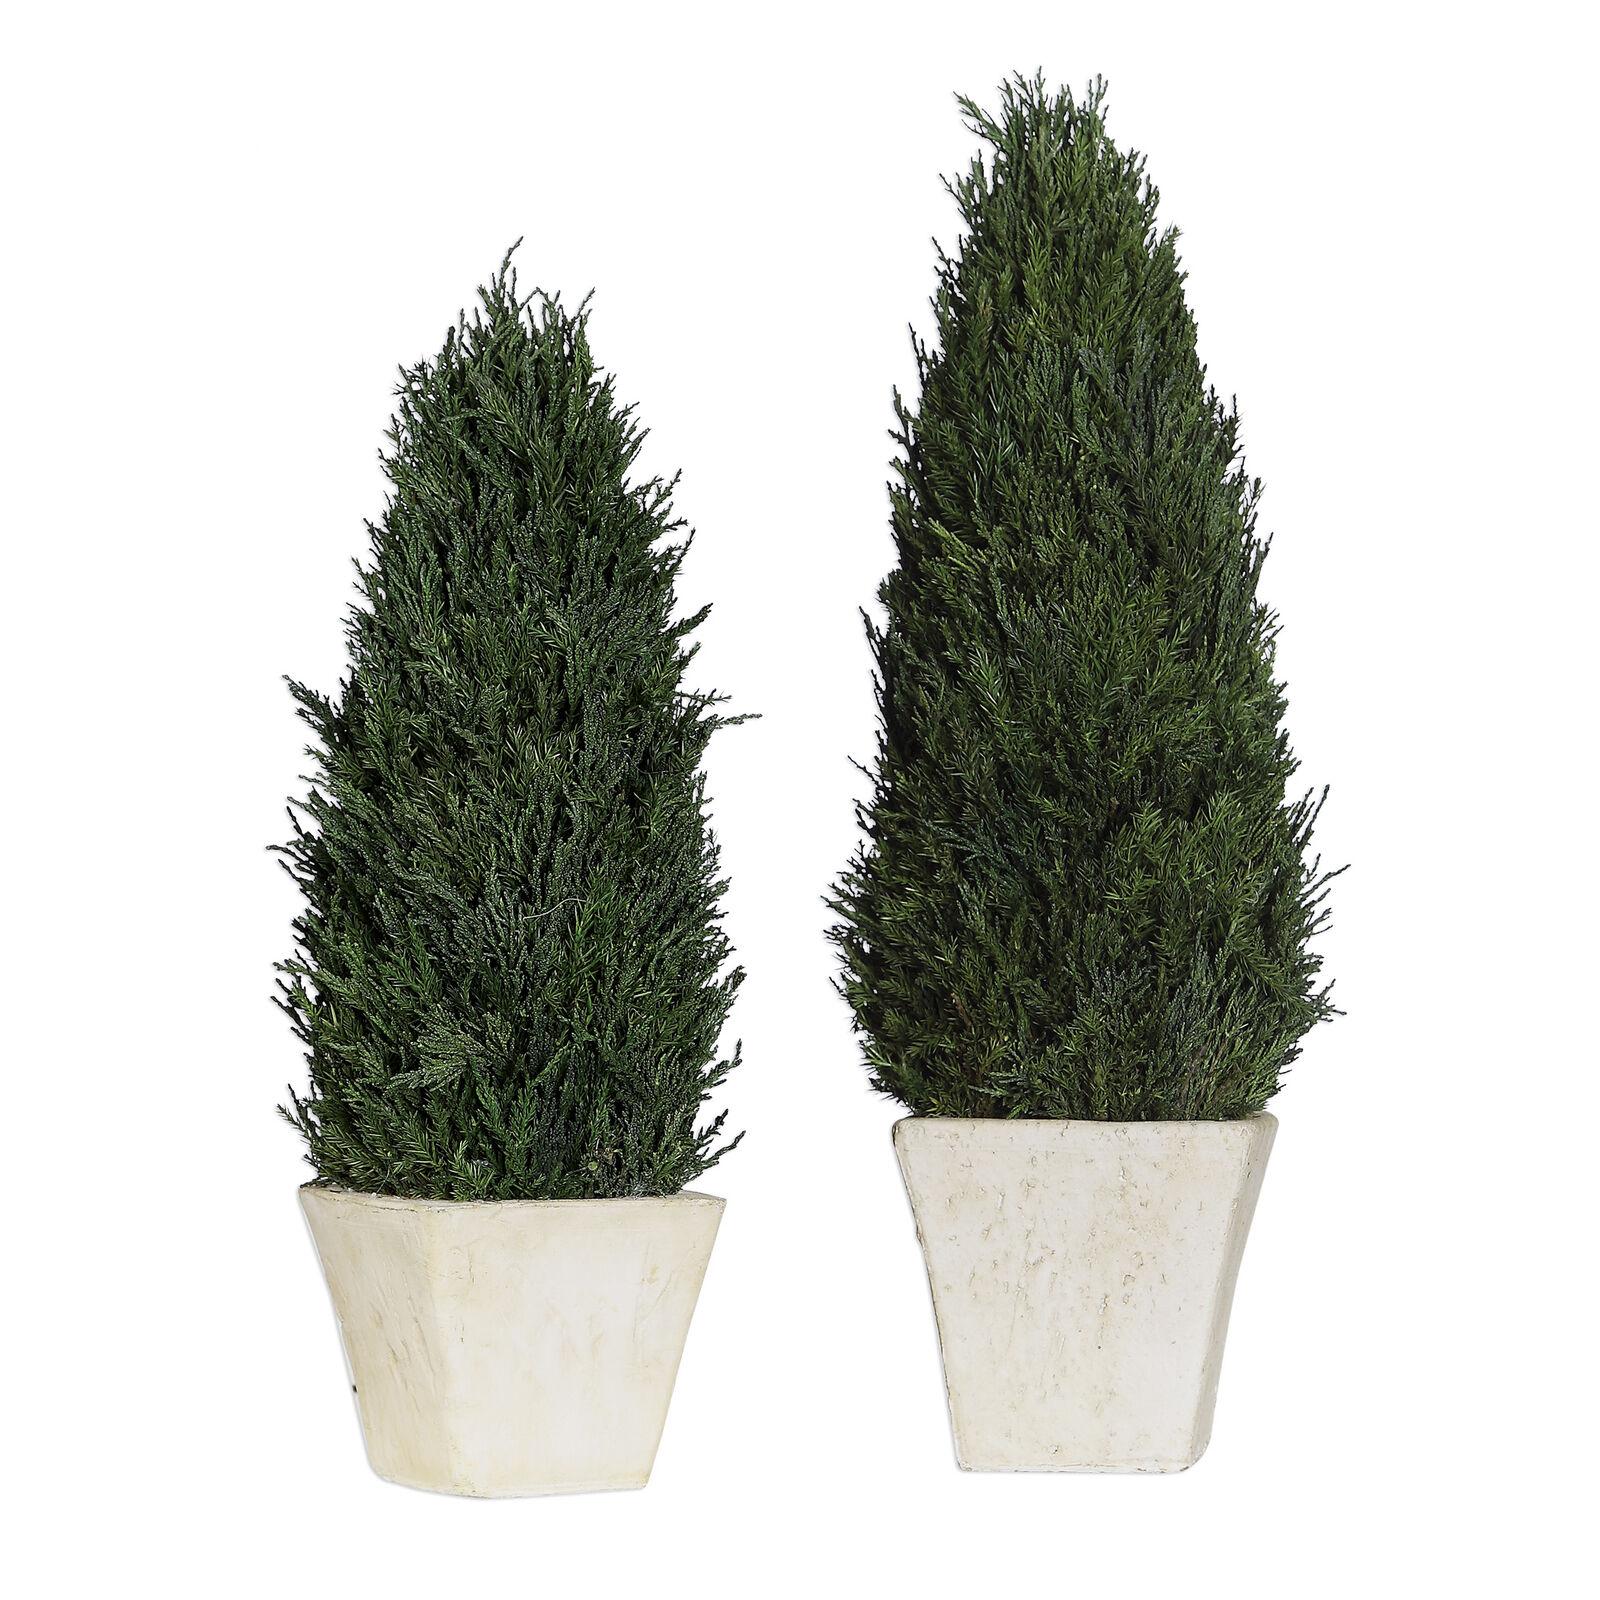 Classic Cypress EverGrün Topiary Set 2 Cone Pyramid Stone Pot Grünery European